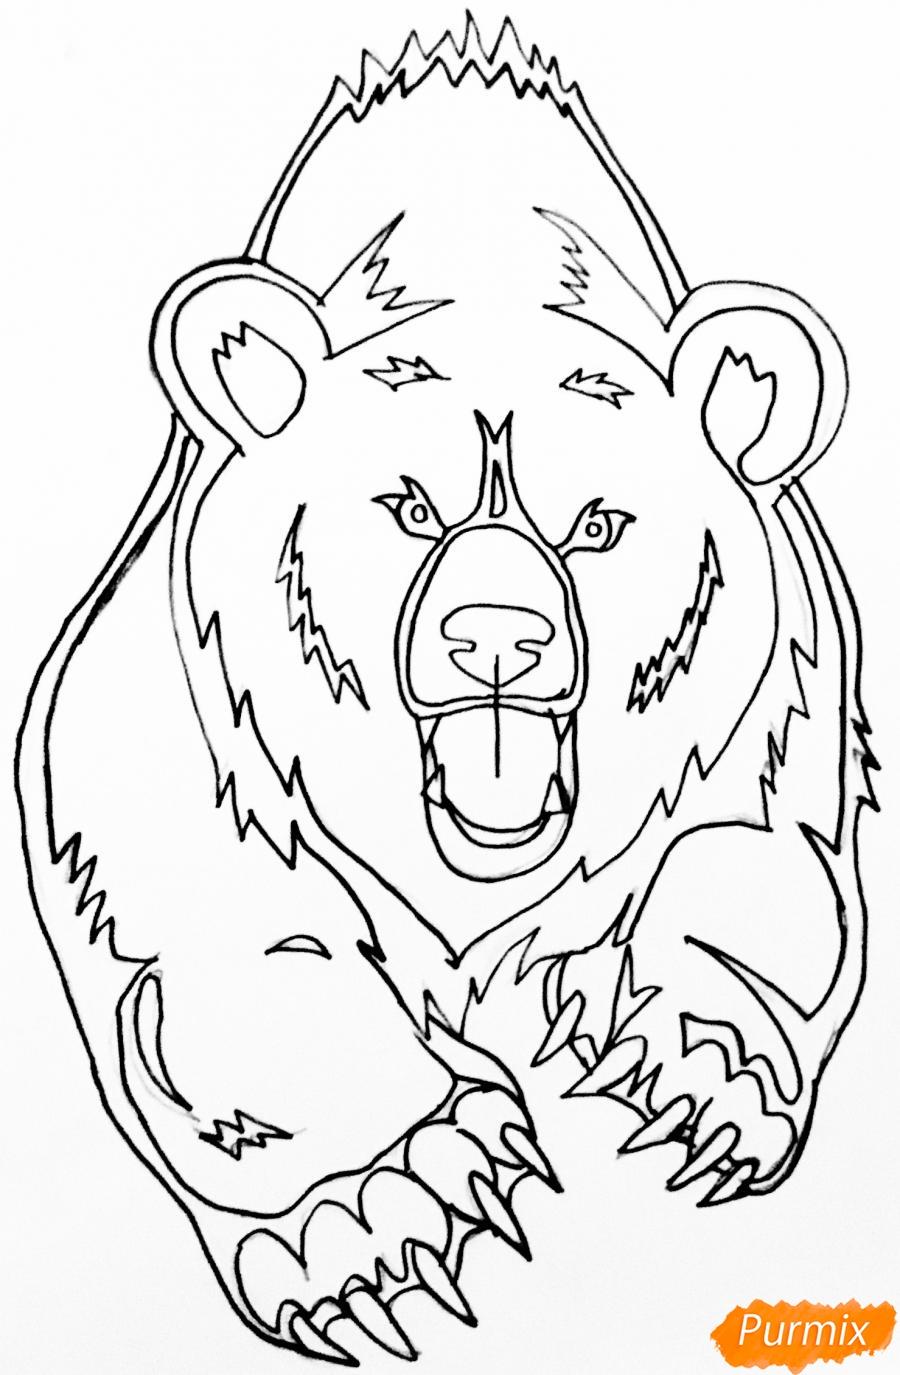 Рисуем медведя в стиле тату - шаг 7